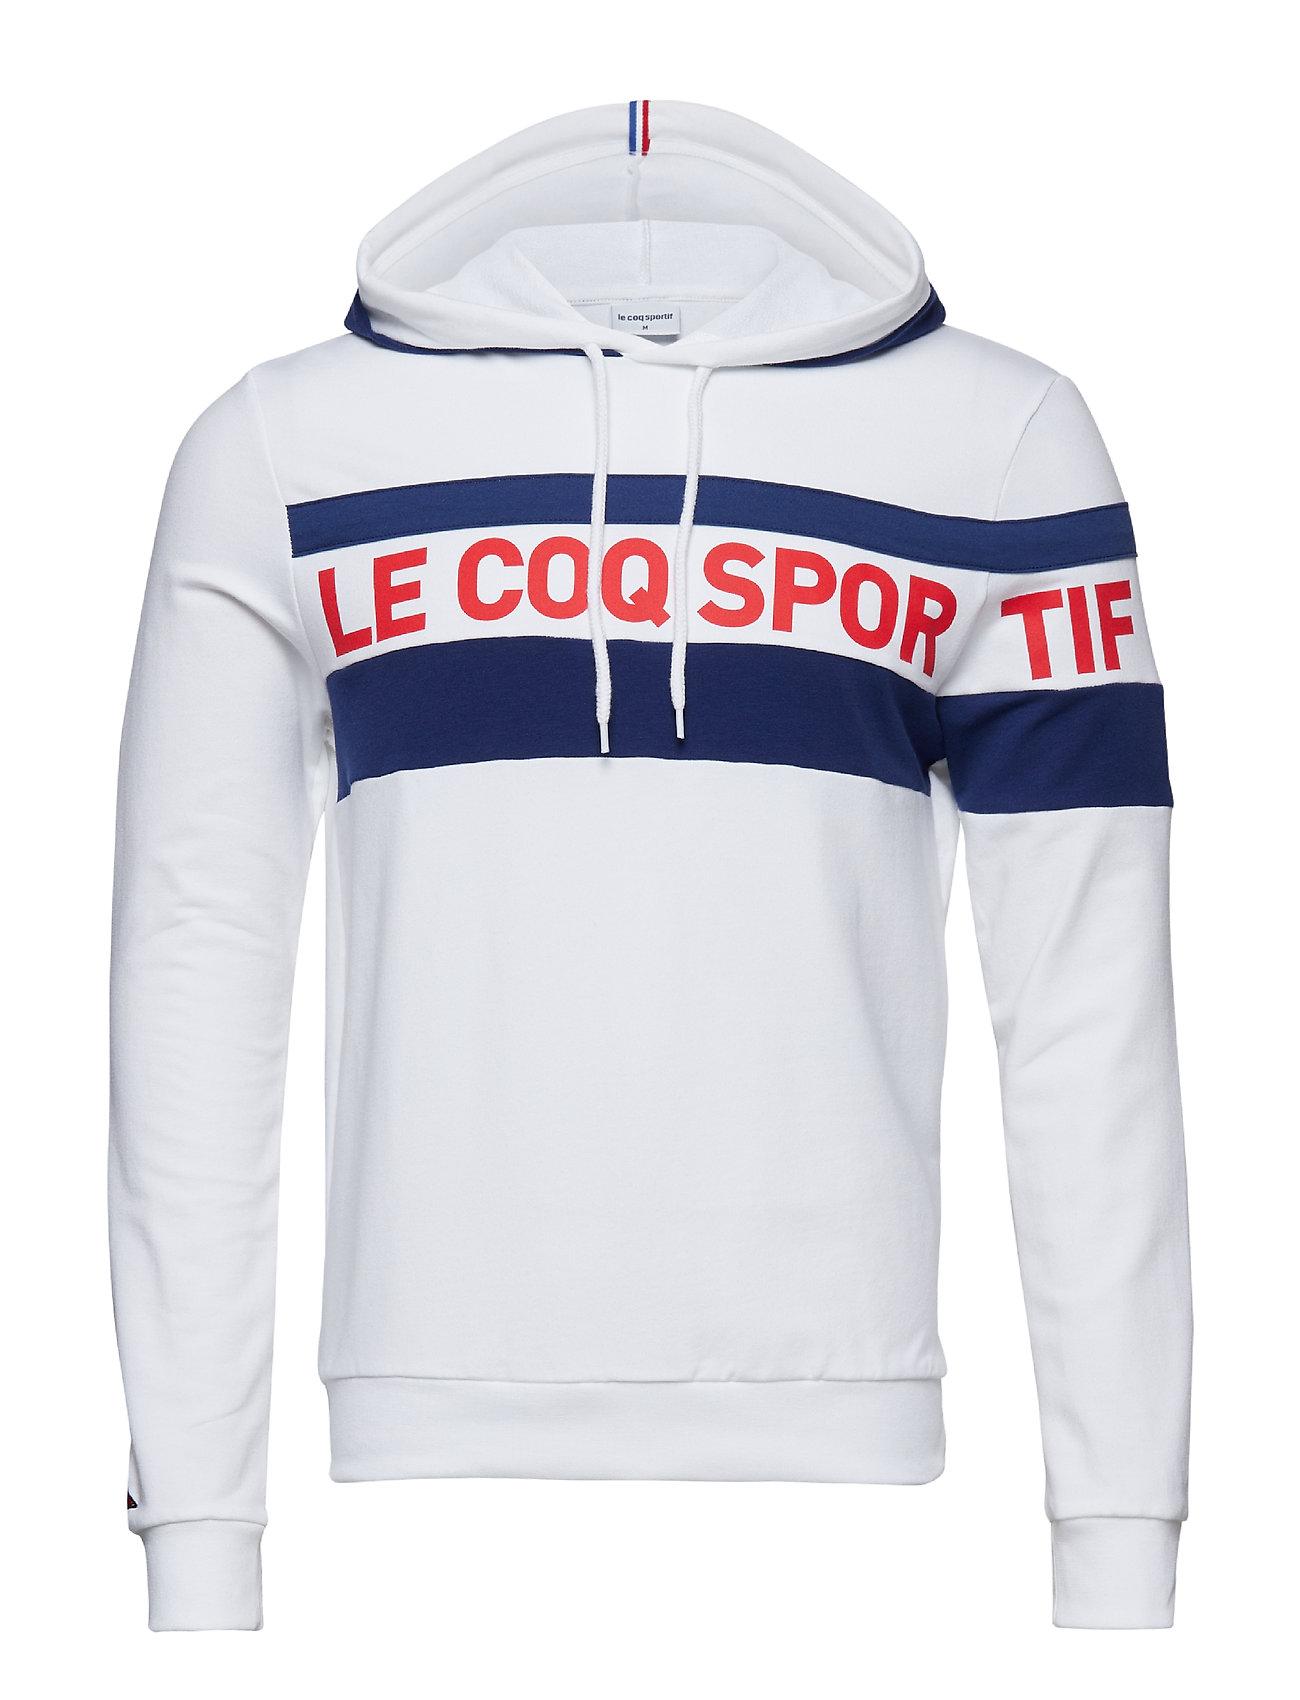 Le Coq Sportif ESS SAISON HOODY N°2 M - OPTICAL WHITE